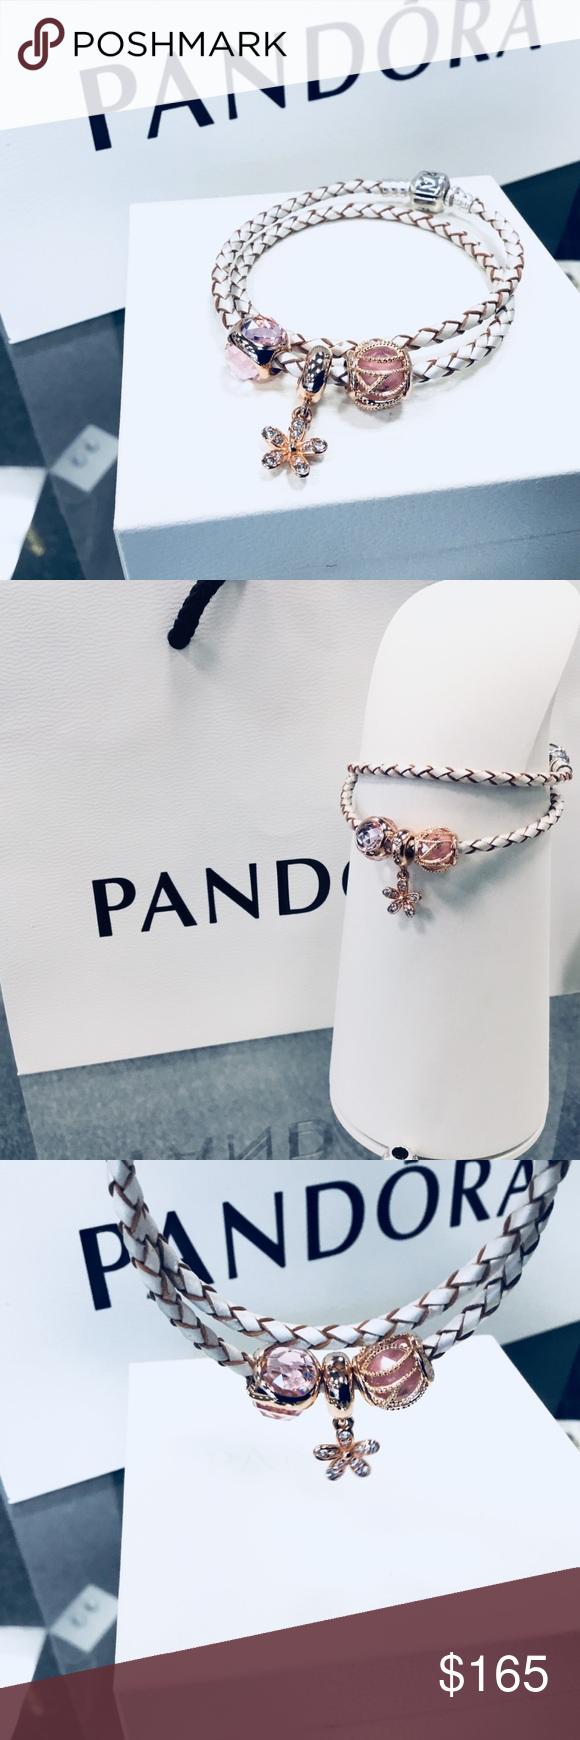 Authentic pandora rose gold bracelet new pandora rose gold